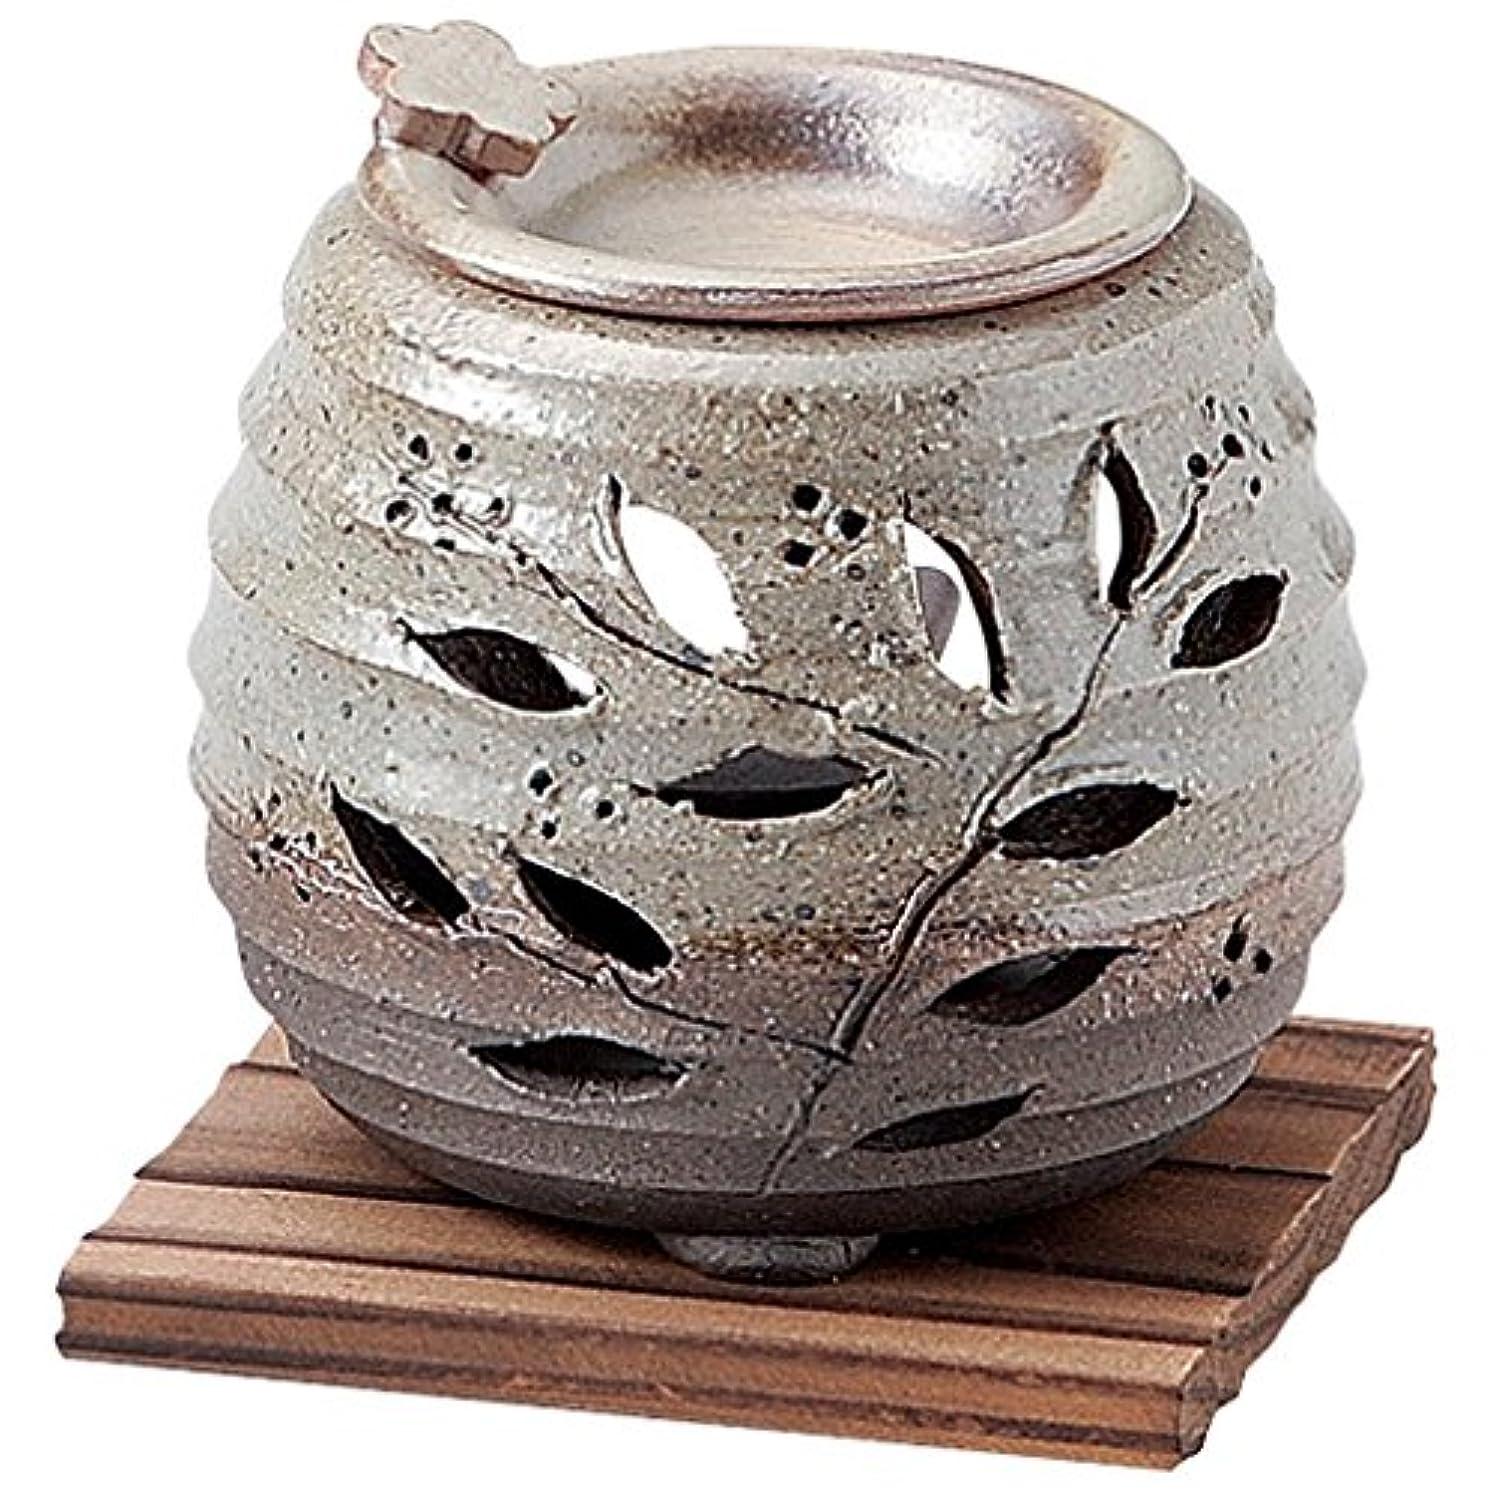 前売ライフル三角山下工芸 常滑焼 石龍緑灰釉花茶香炉 板付 10.5×11×11cm 13045750